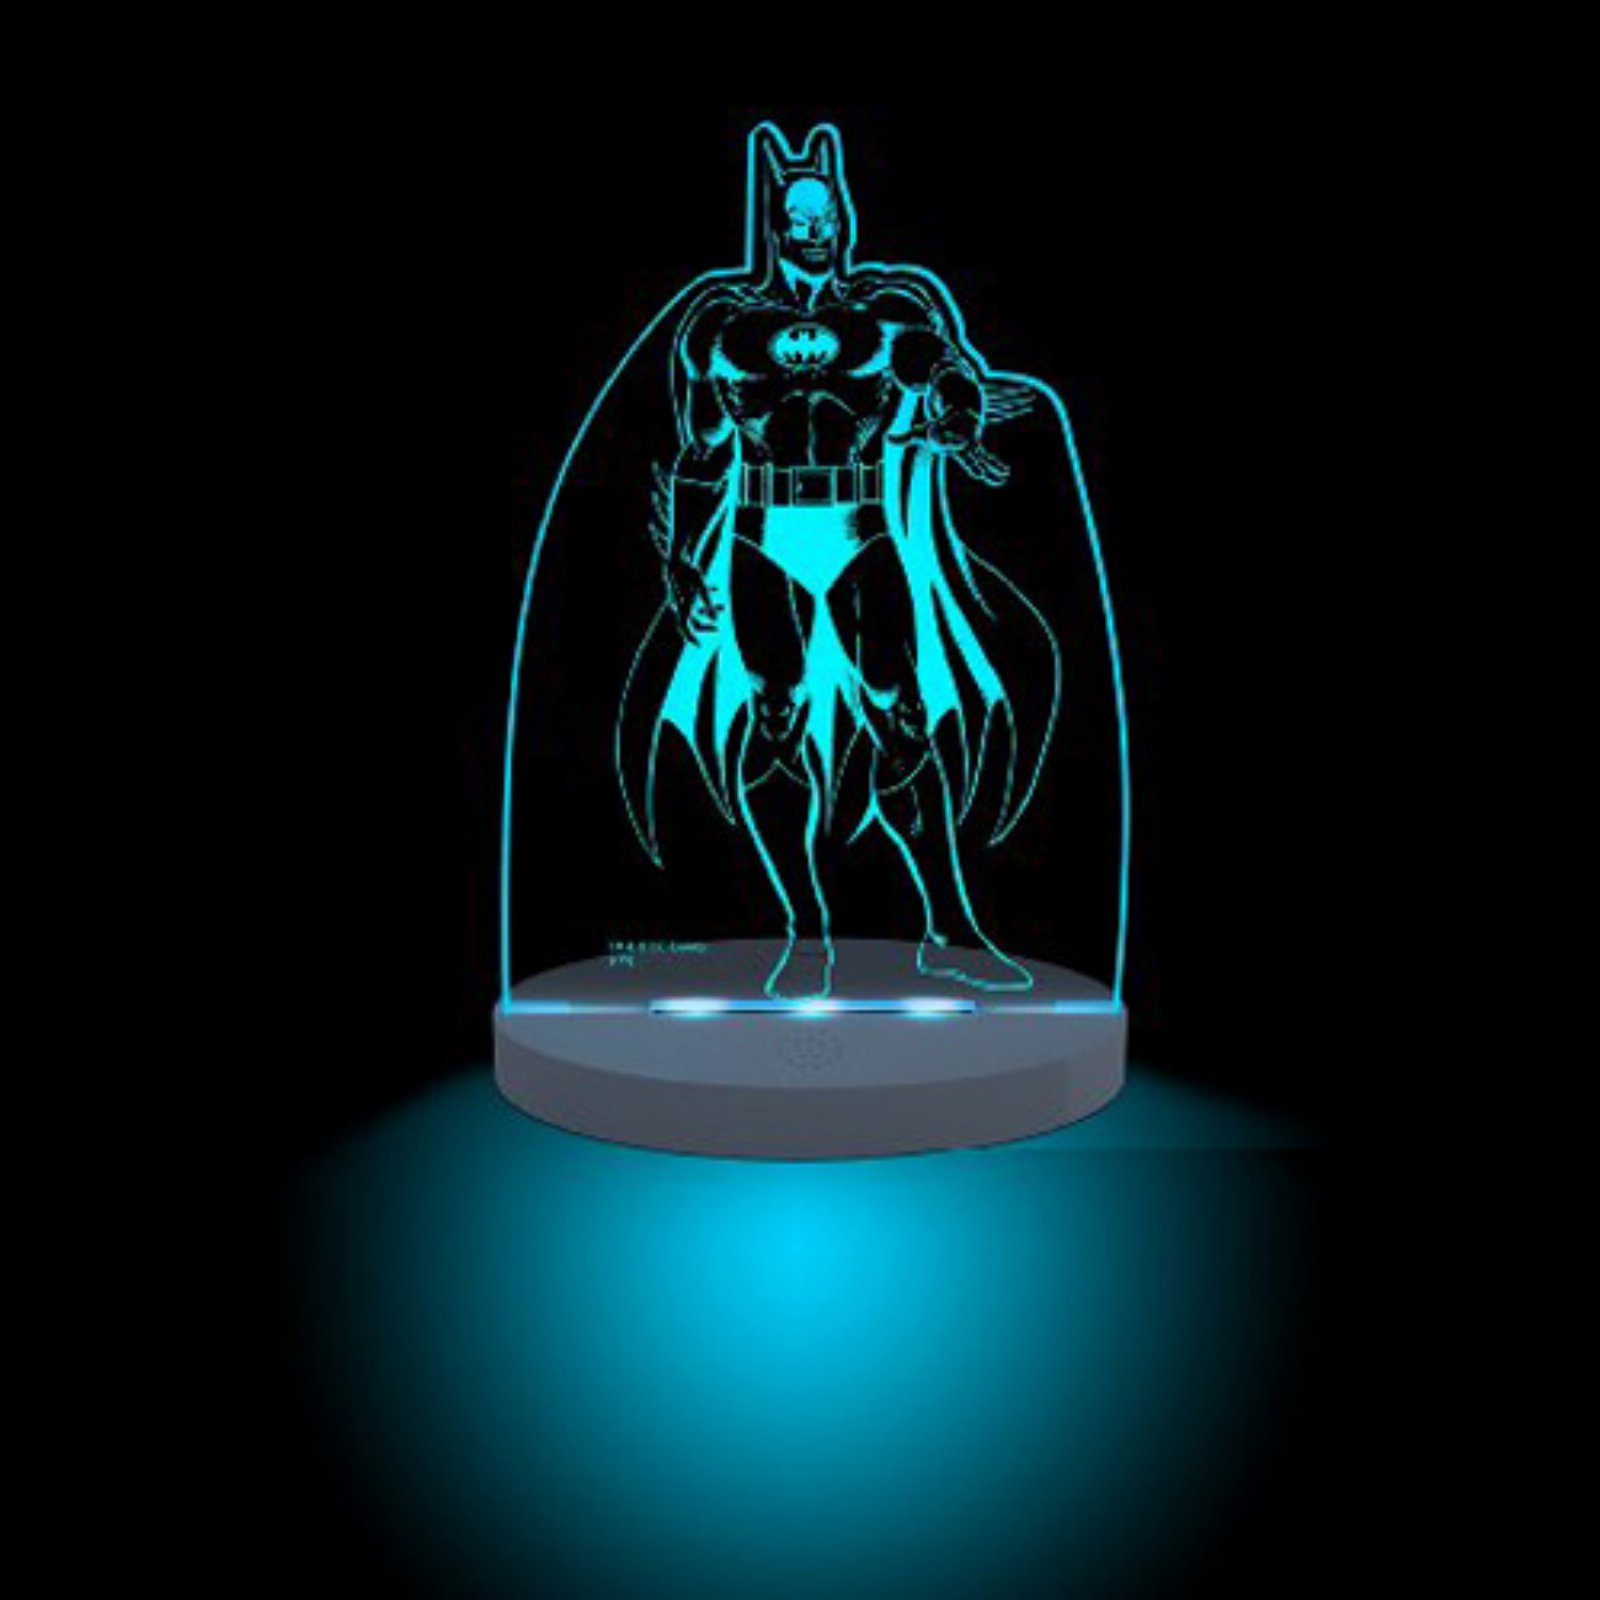 Total Dreamz Batman Multicolored LED Night Light